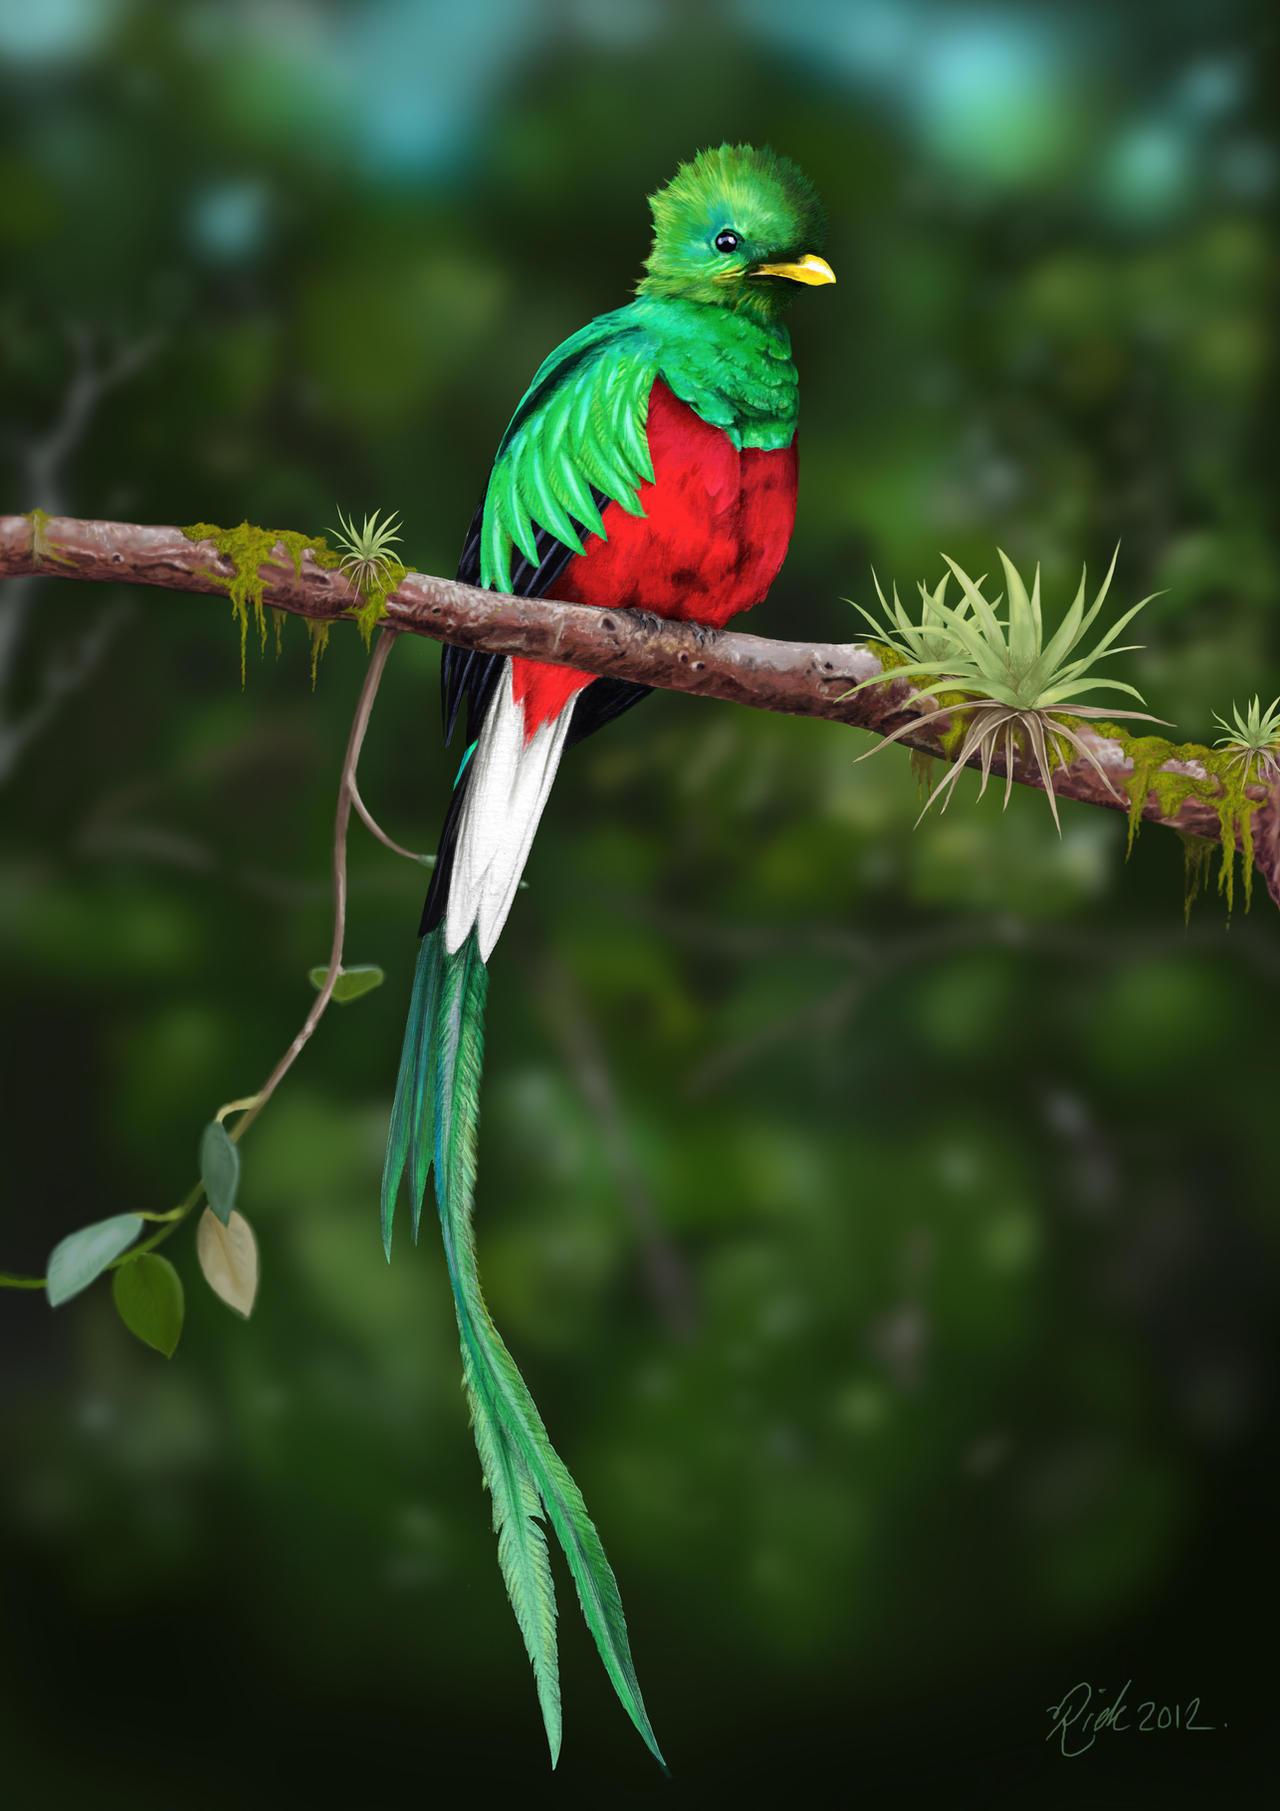 Resplendent Quetzal 2 (Digital Painting)